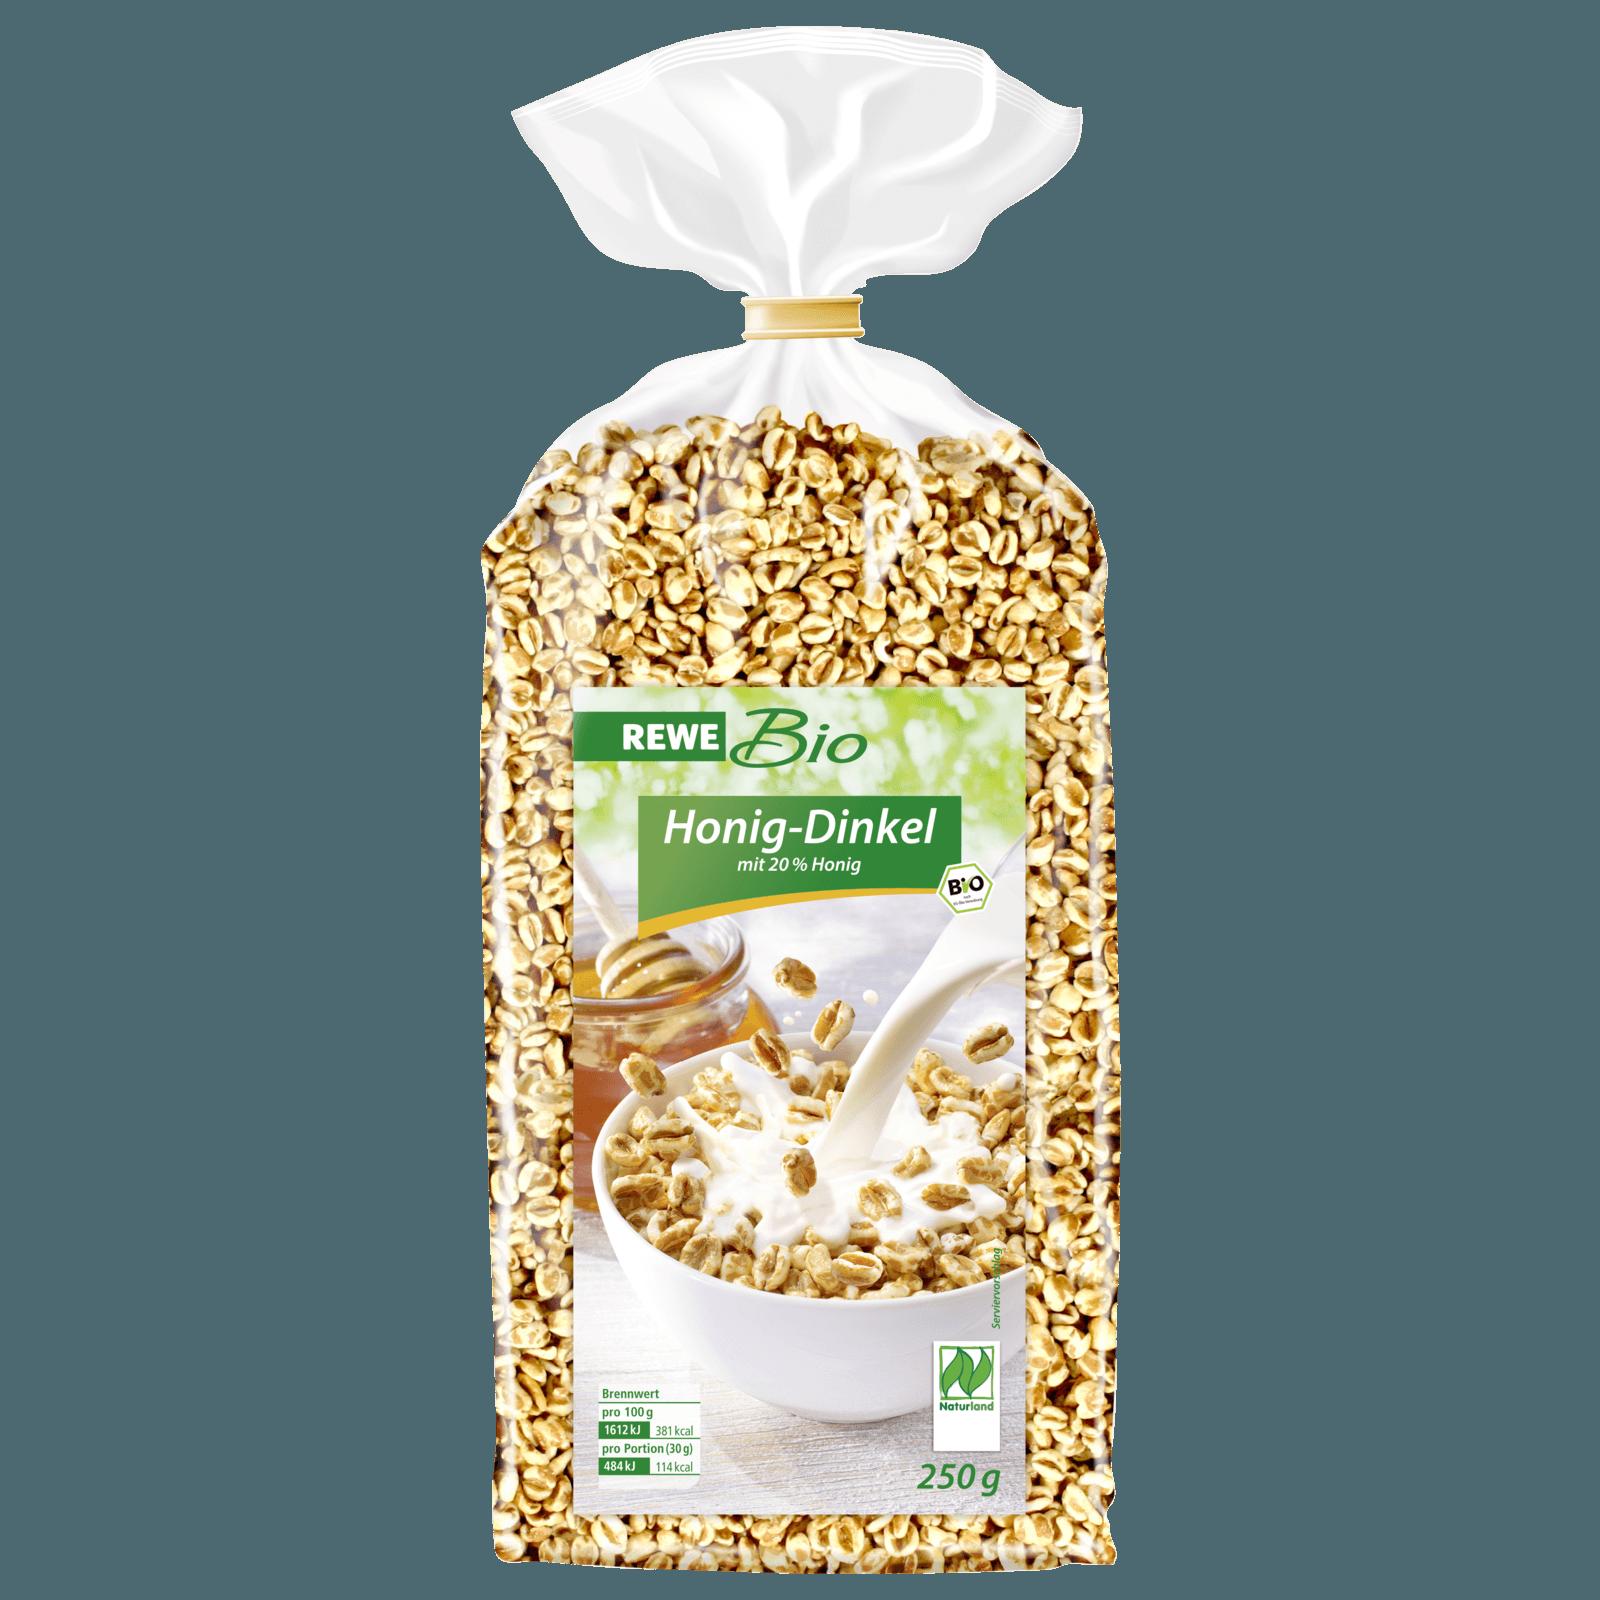 REWE Bio Honig-Dinkel-Pops 250g